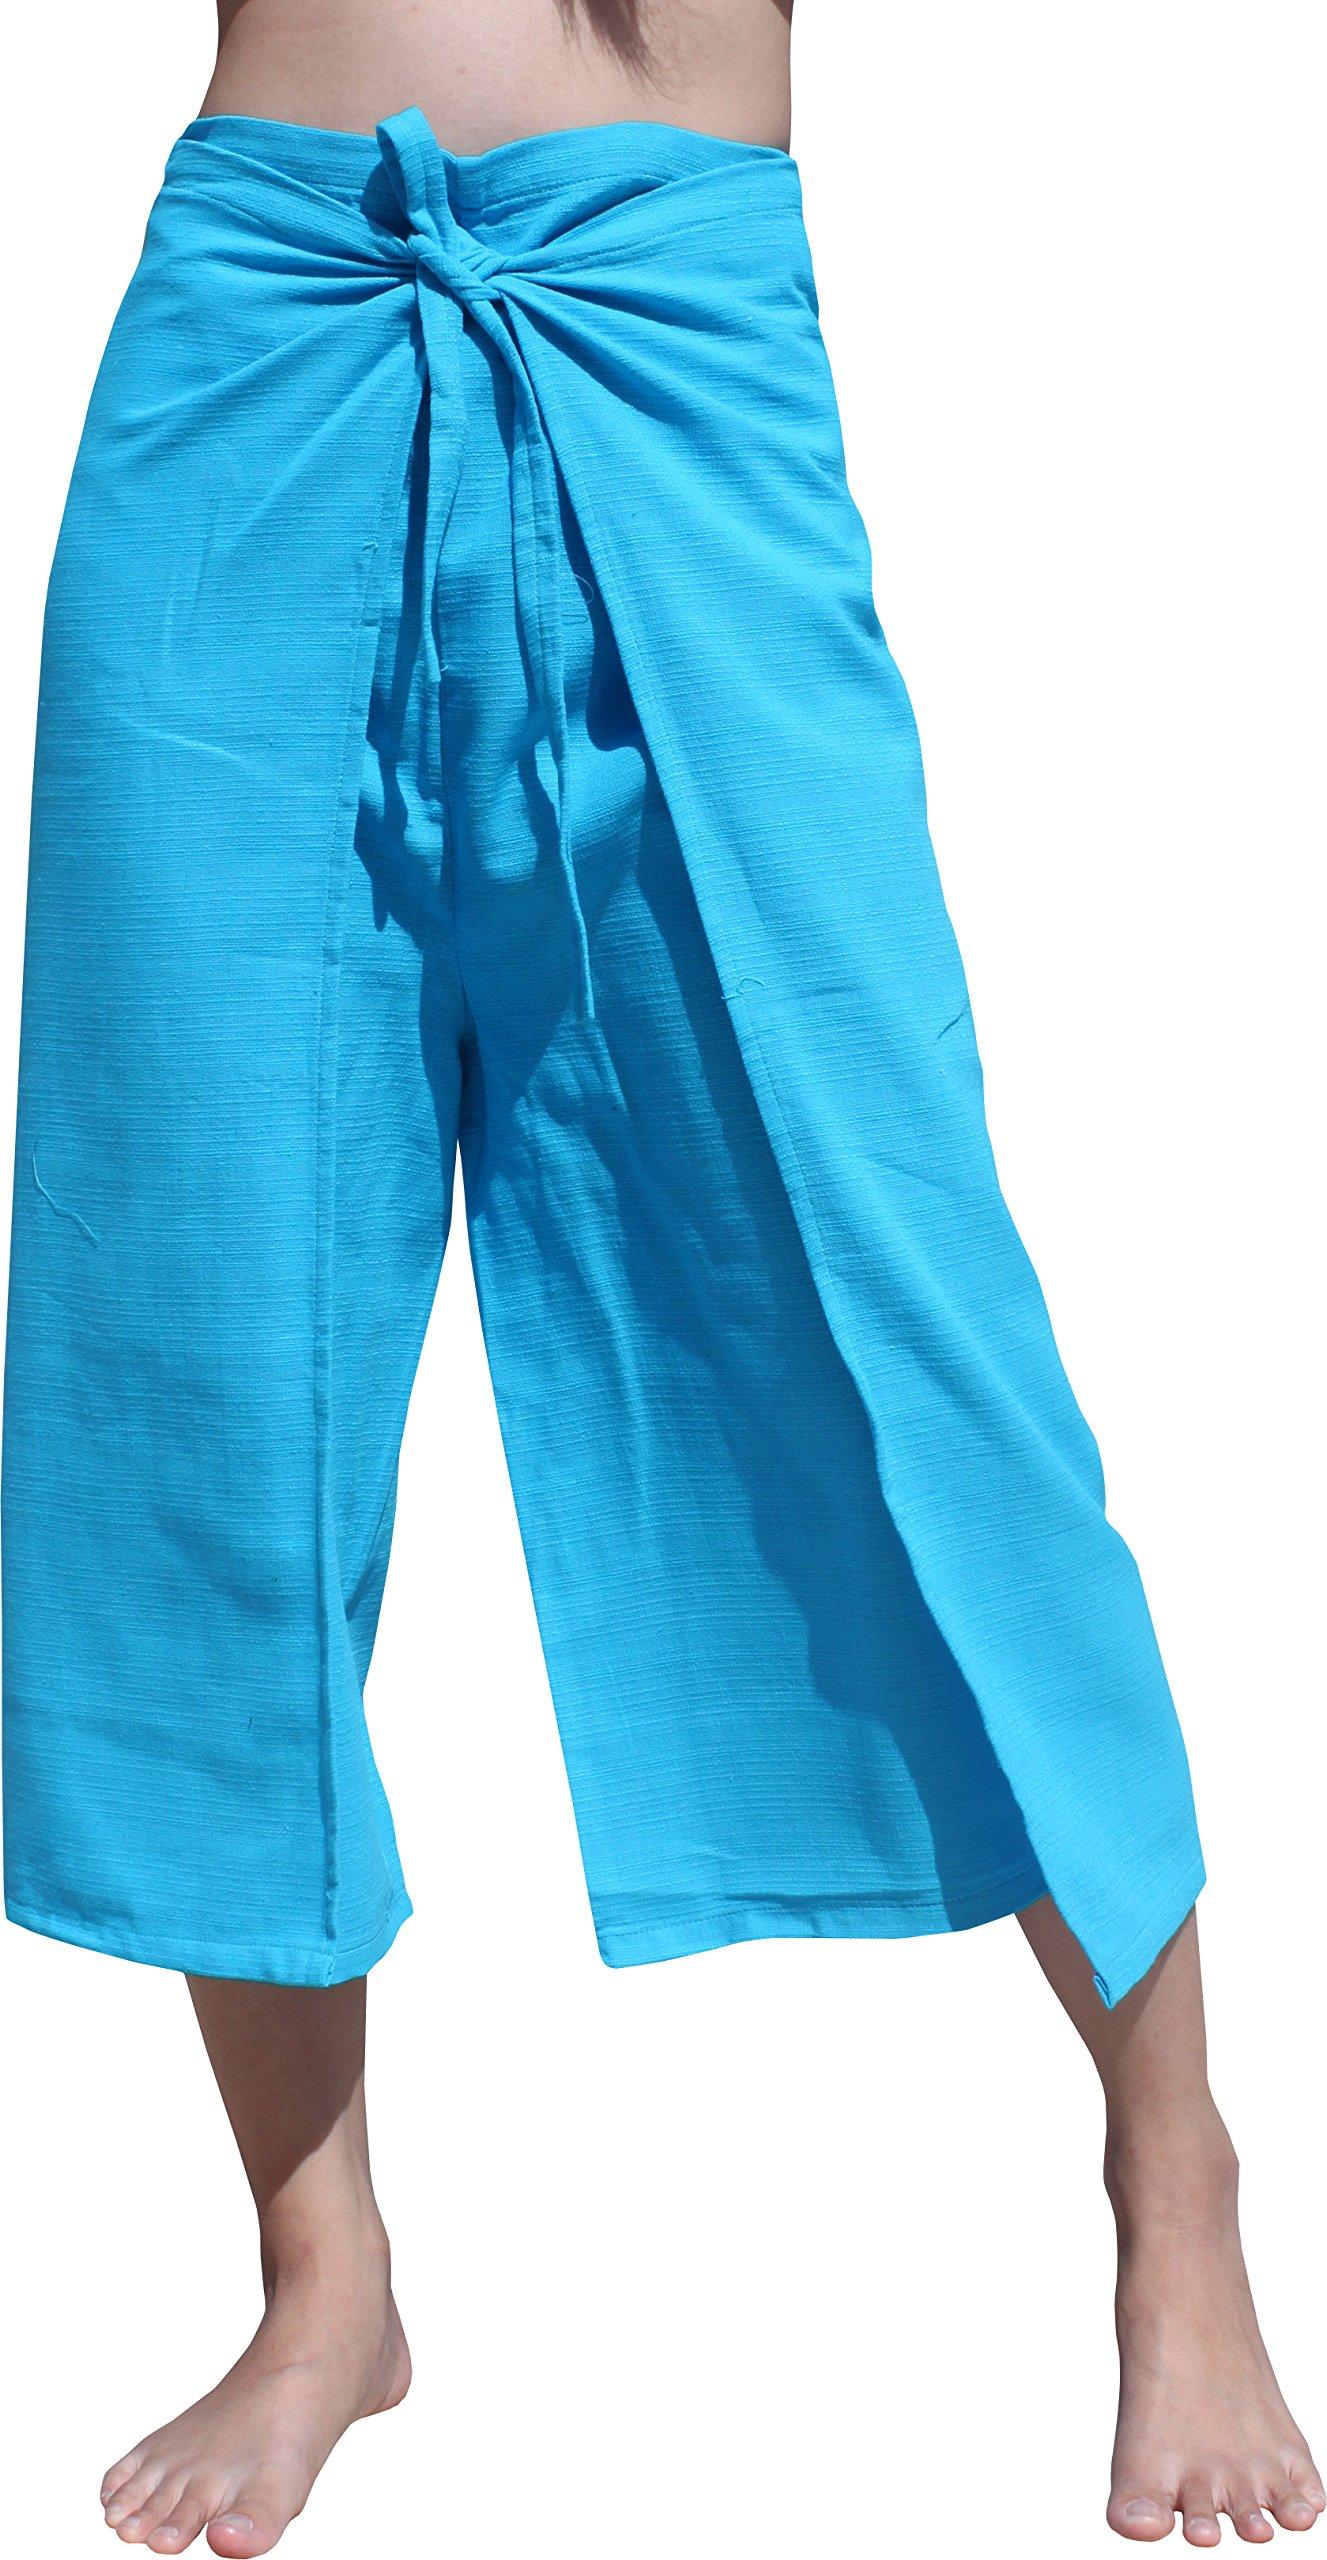 RaanPahMuang Drive In Wrap Pants In Summer Plain Mixed Cotton, Medium, Yeaphai Cotton - Neon Blue by RaanPahMuang